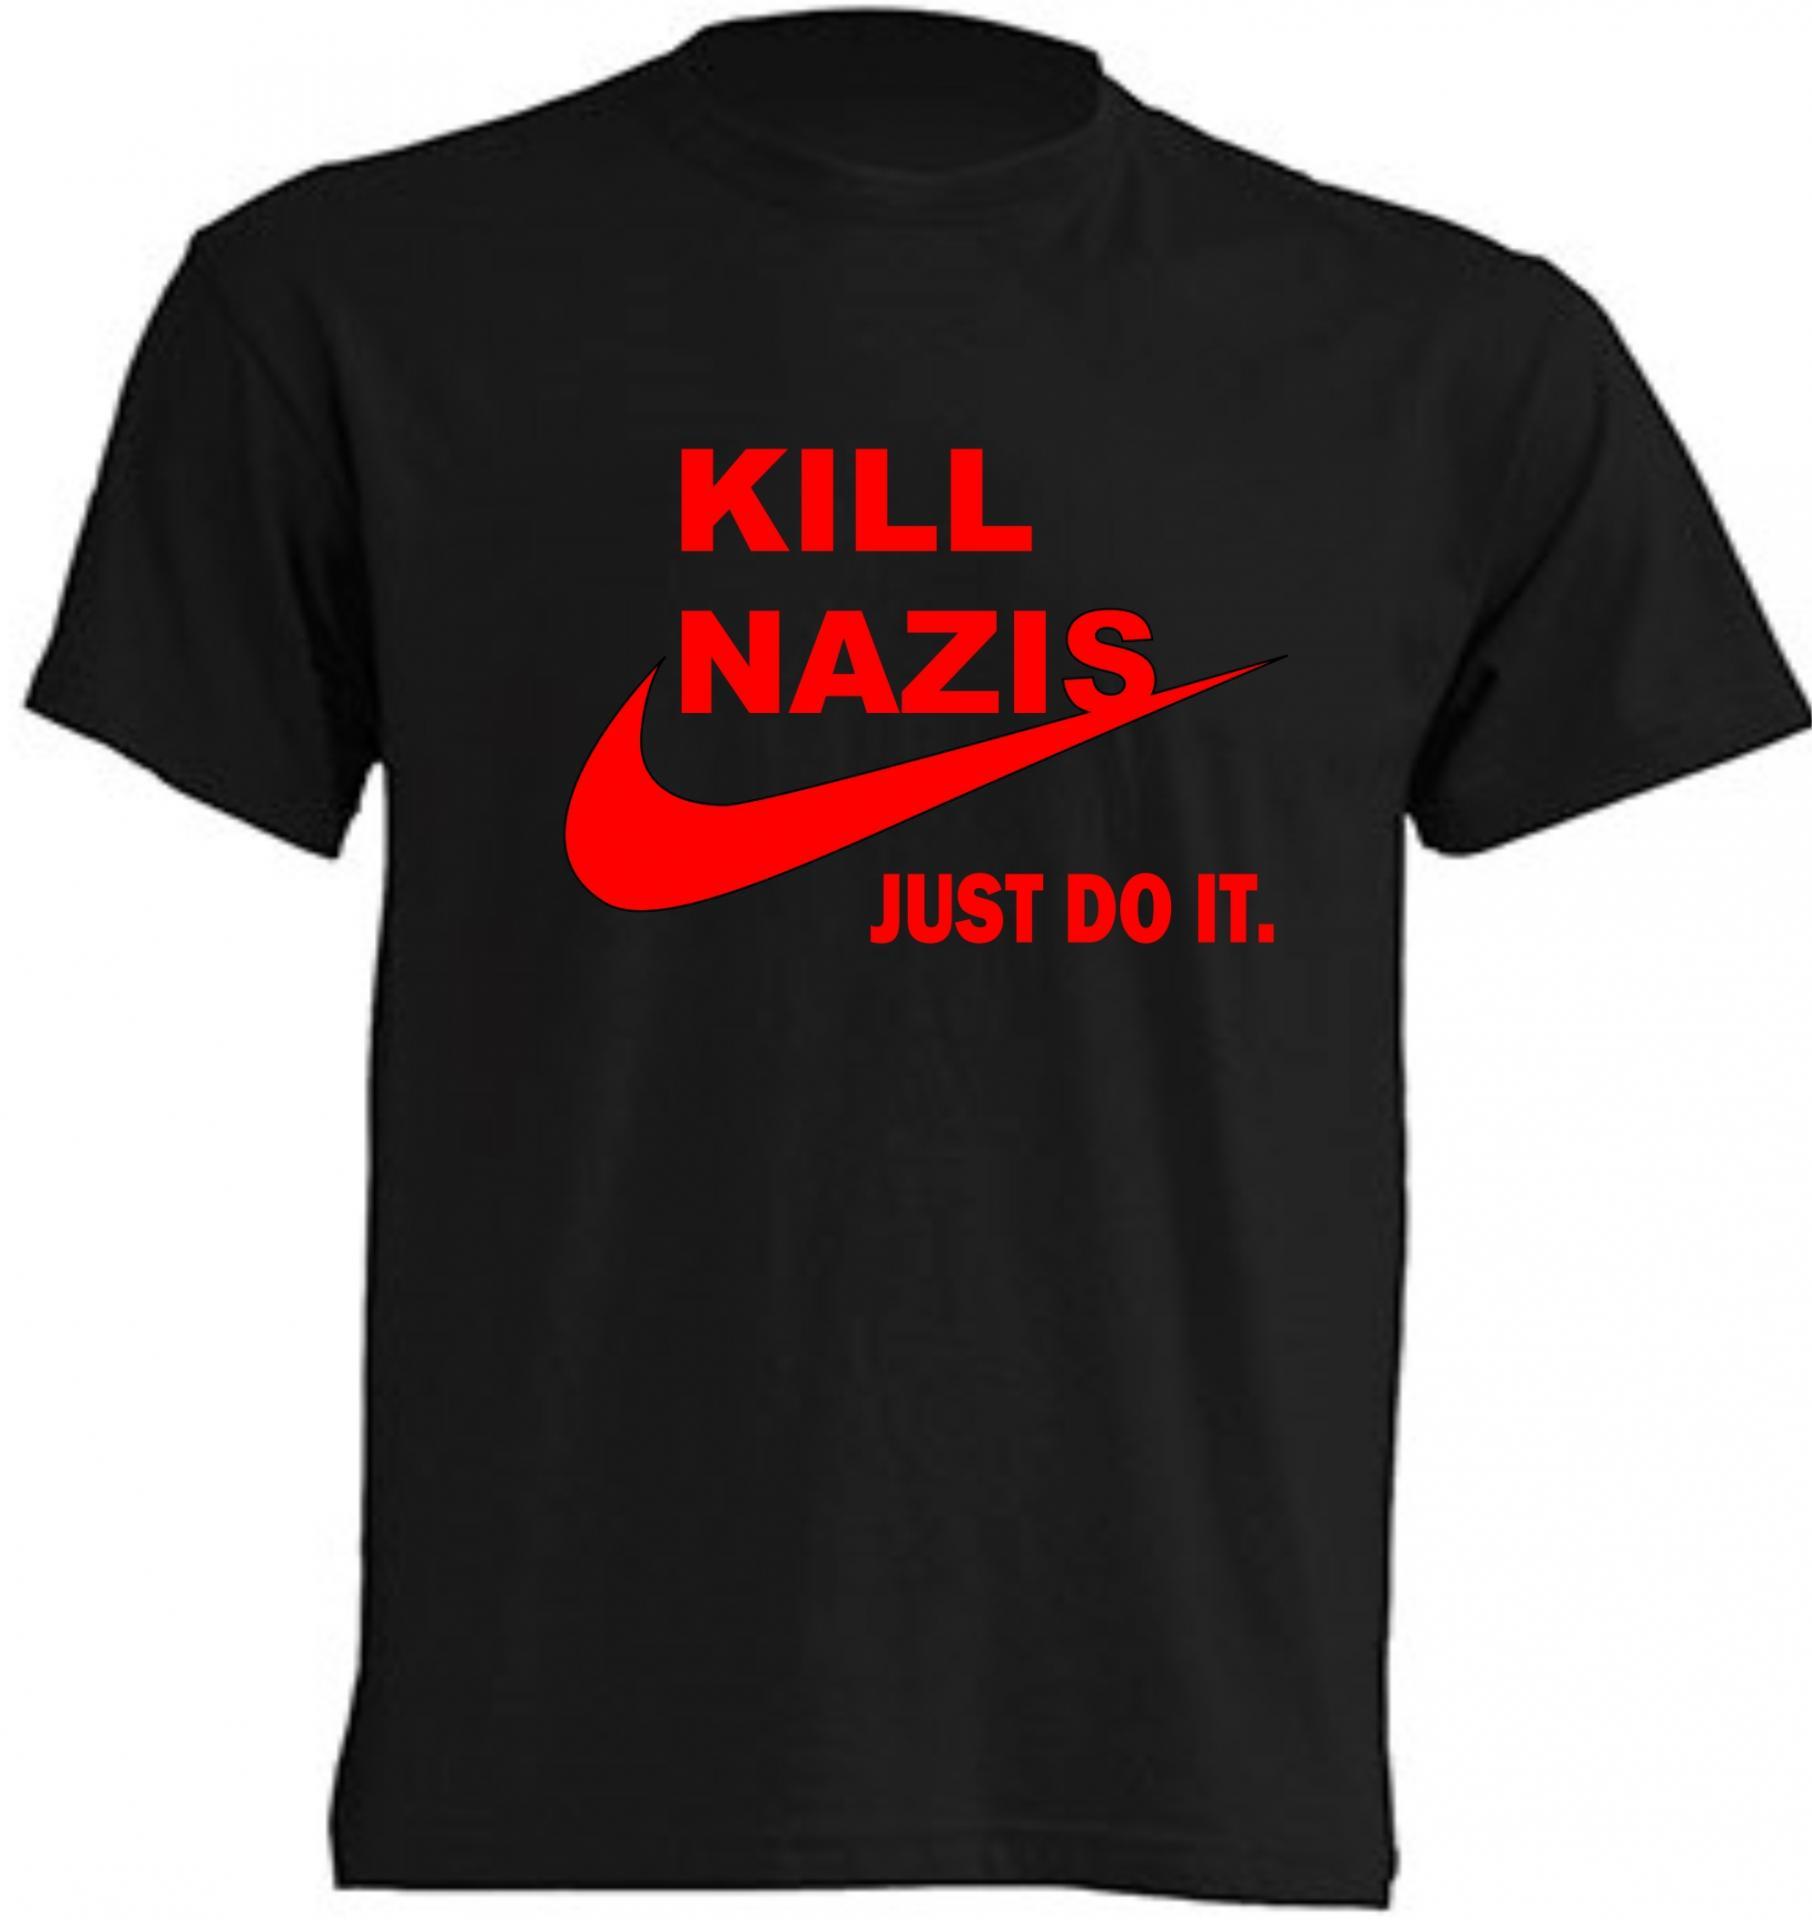 CAMISETA KILL NAZIS